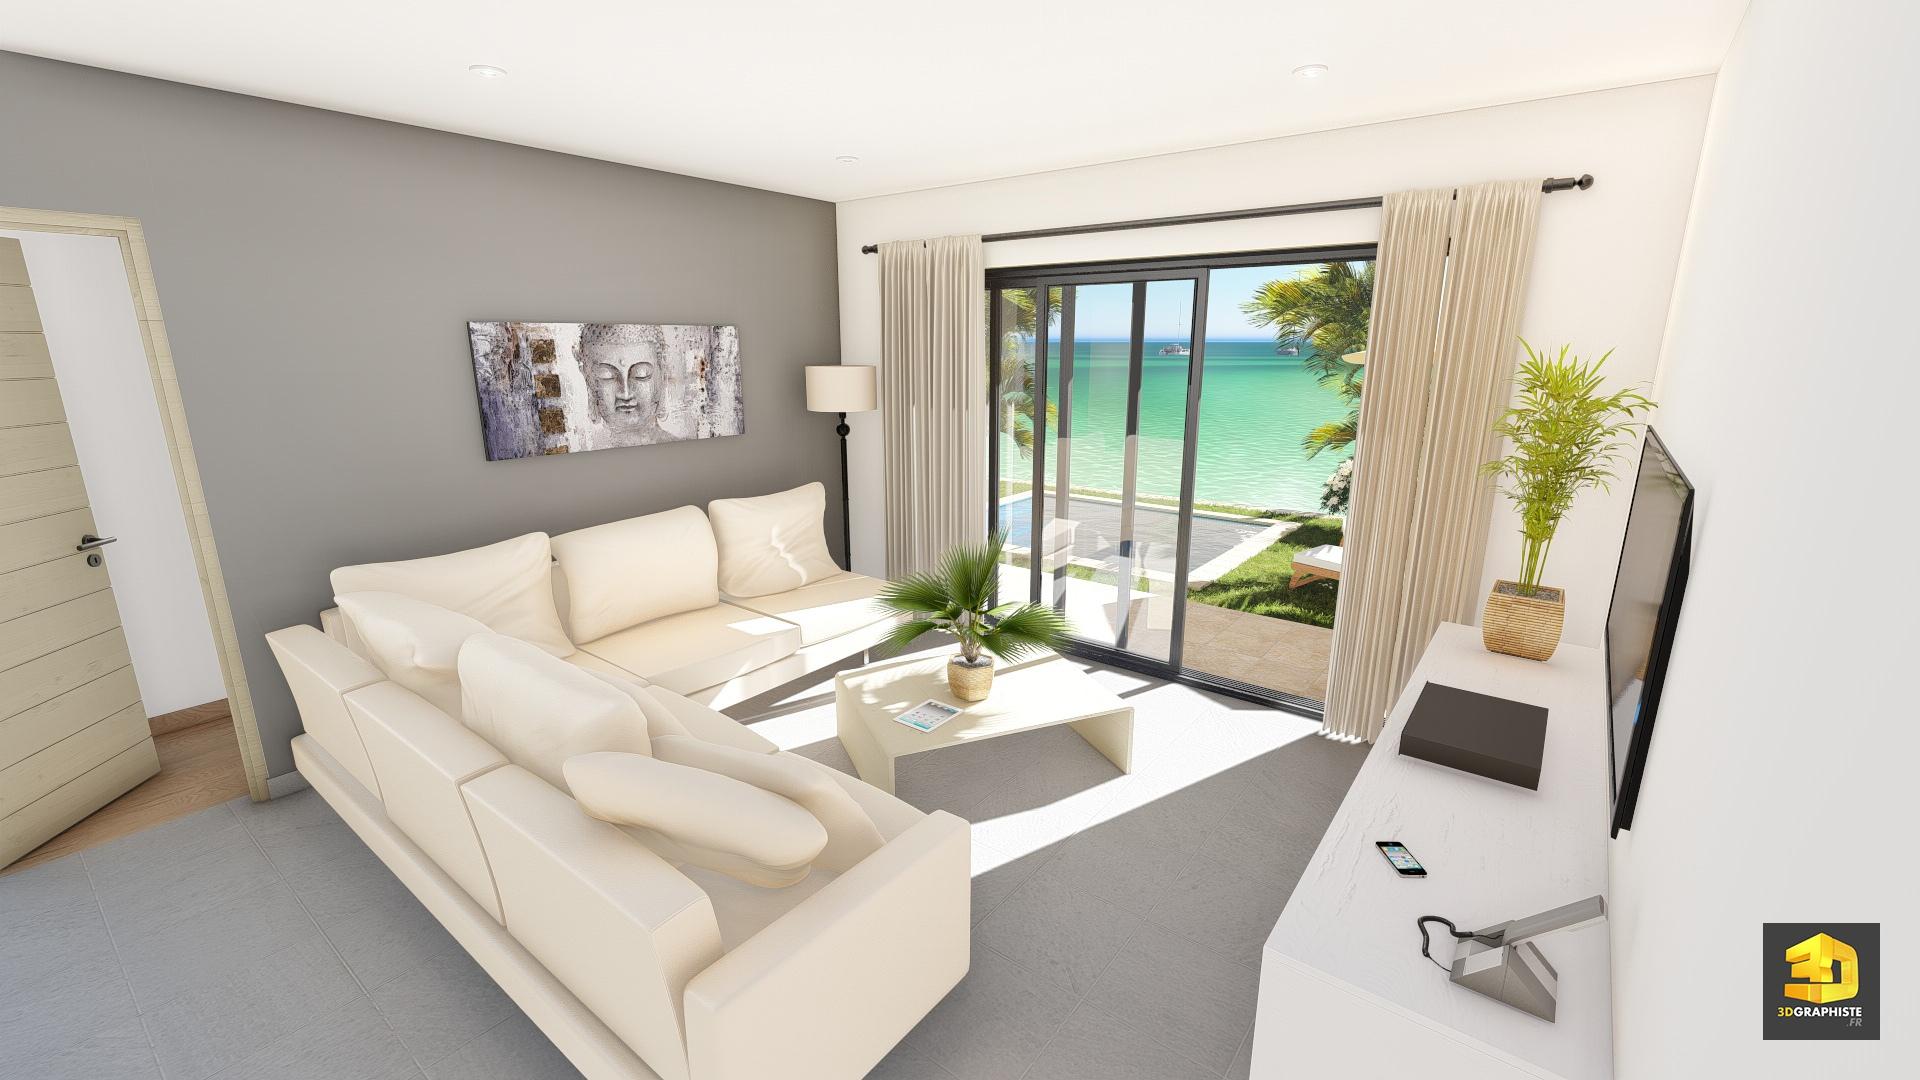 perspectives 3d pour l 39 immobilier villas domenjod 3dgraphiste fr. Black Bedroom Furniture Sets. Home Design Ideas